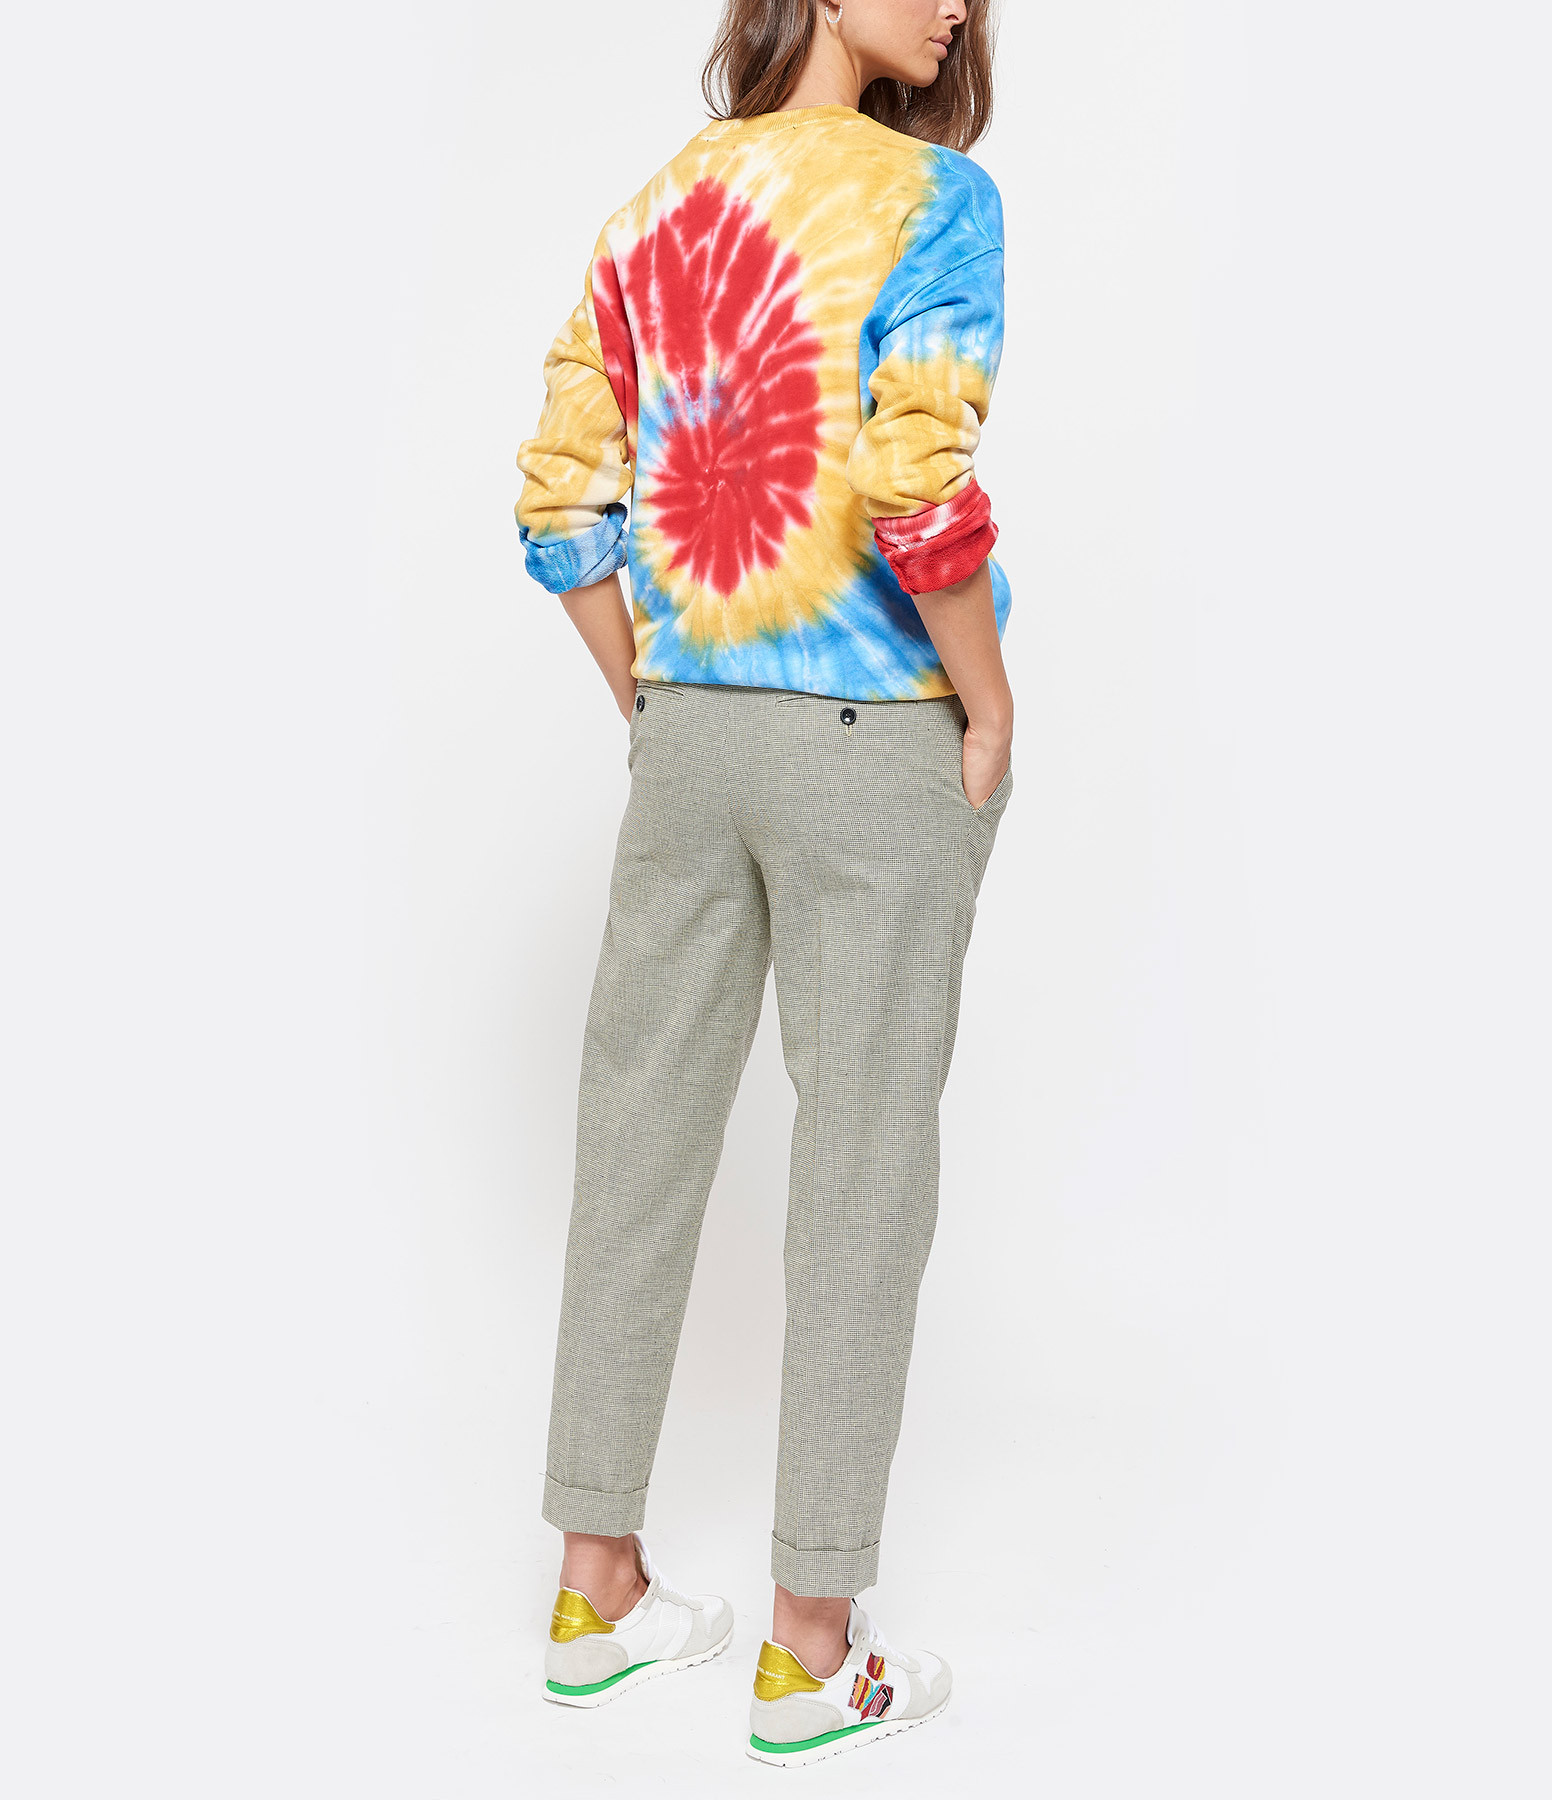 GARCONS INFIDELES - Sweatshirt Tie And Dye Multicolore